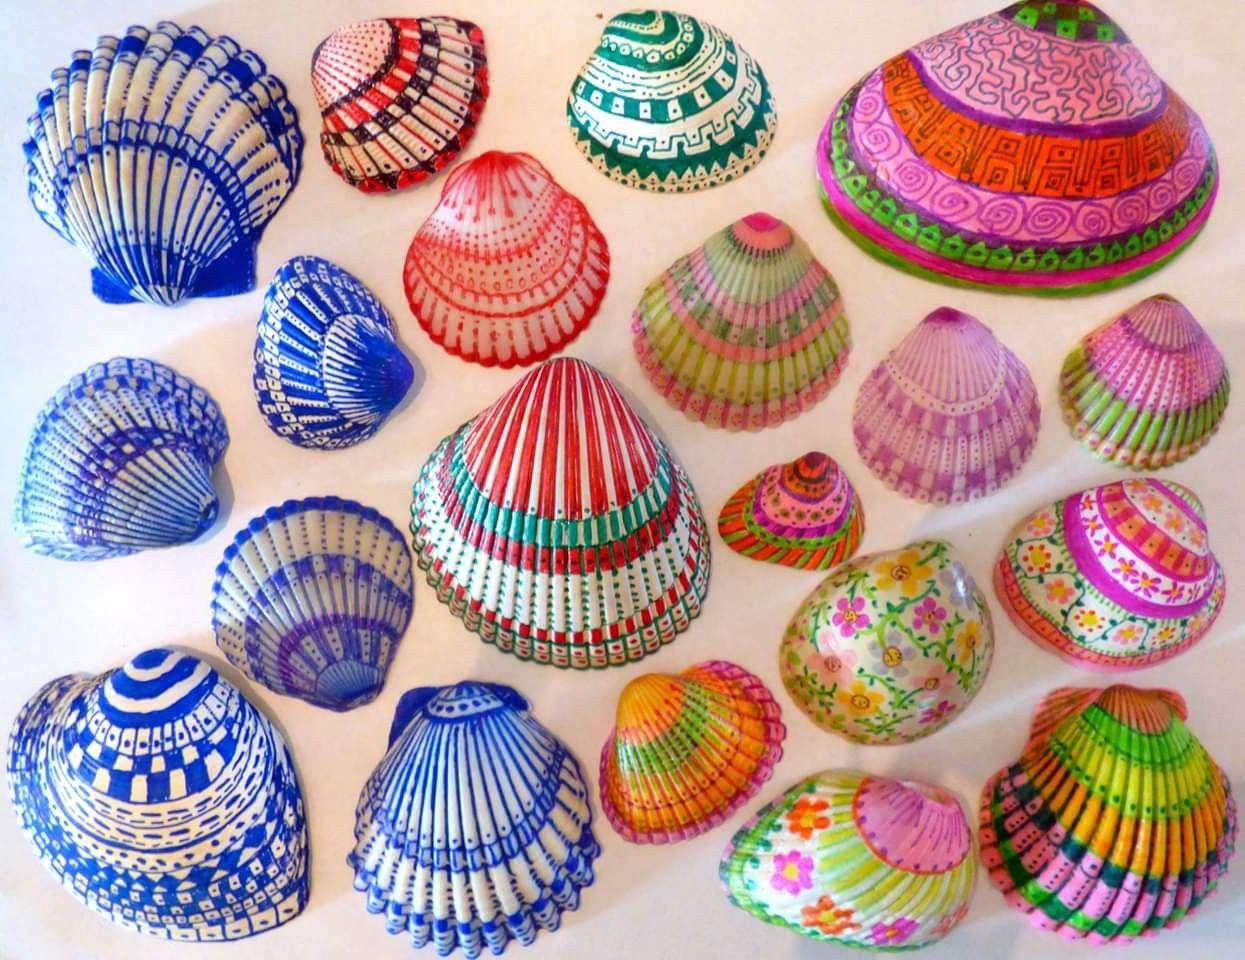 Coloring Seashells With Sharpies Seashell Crafts Sharpie Crafts Shell Crafts